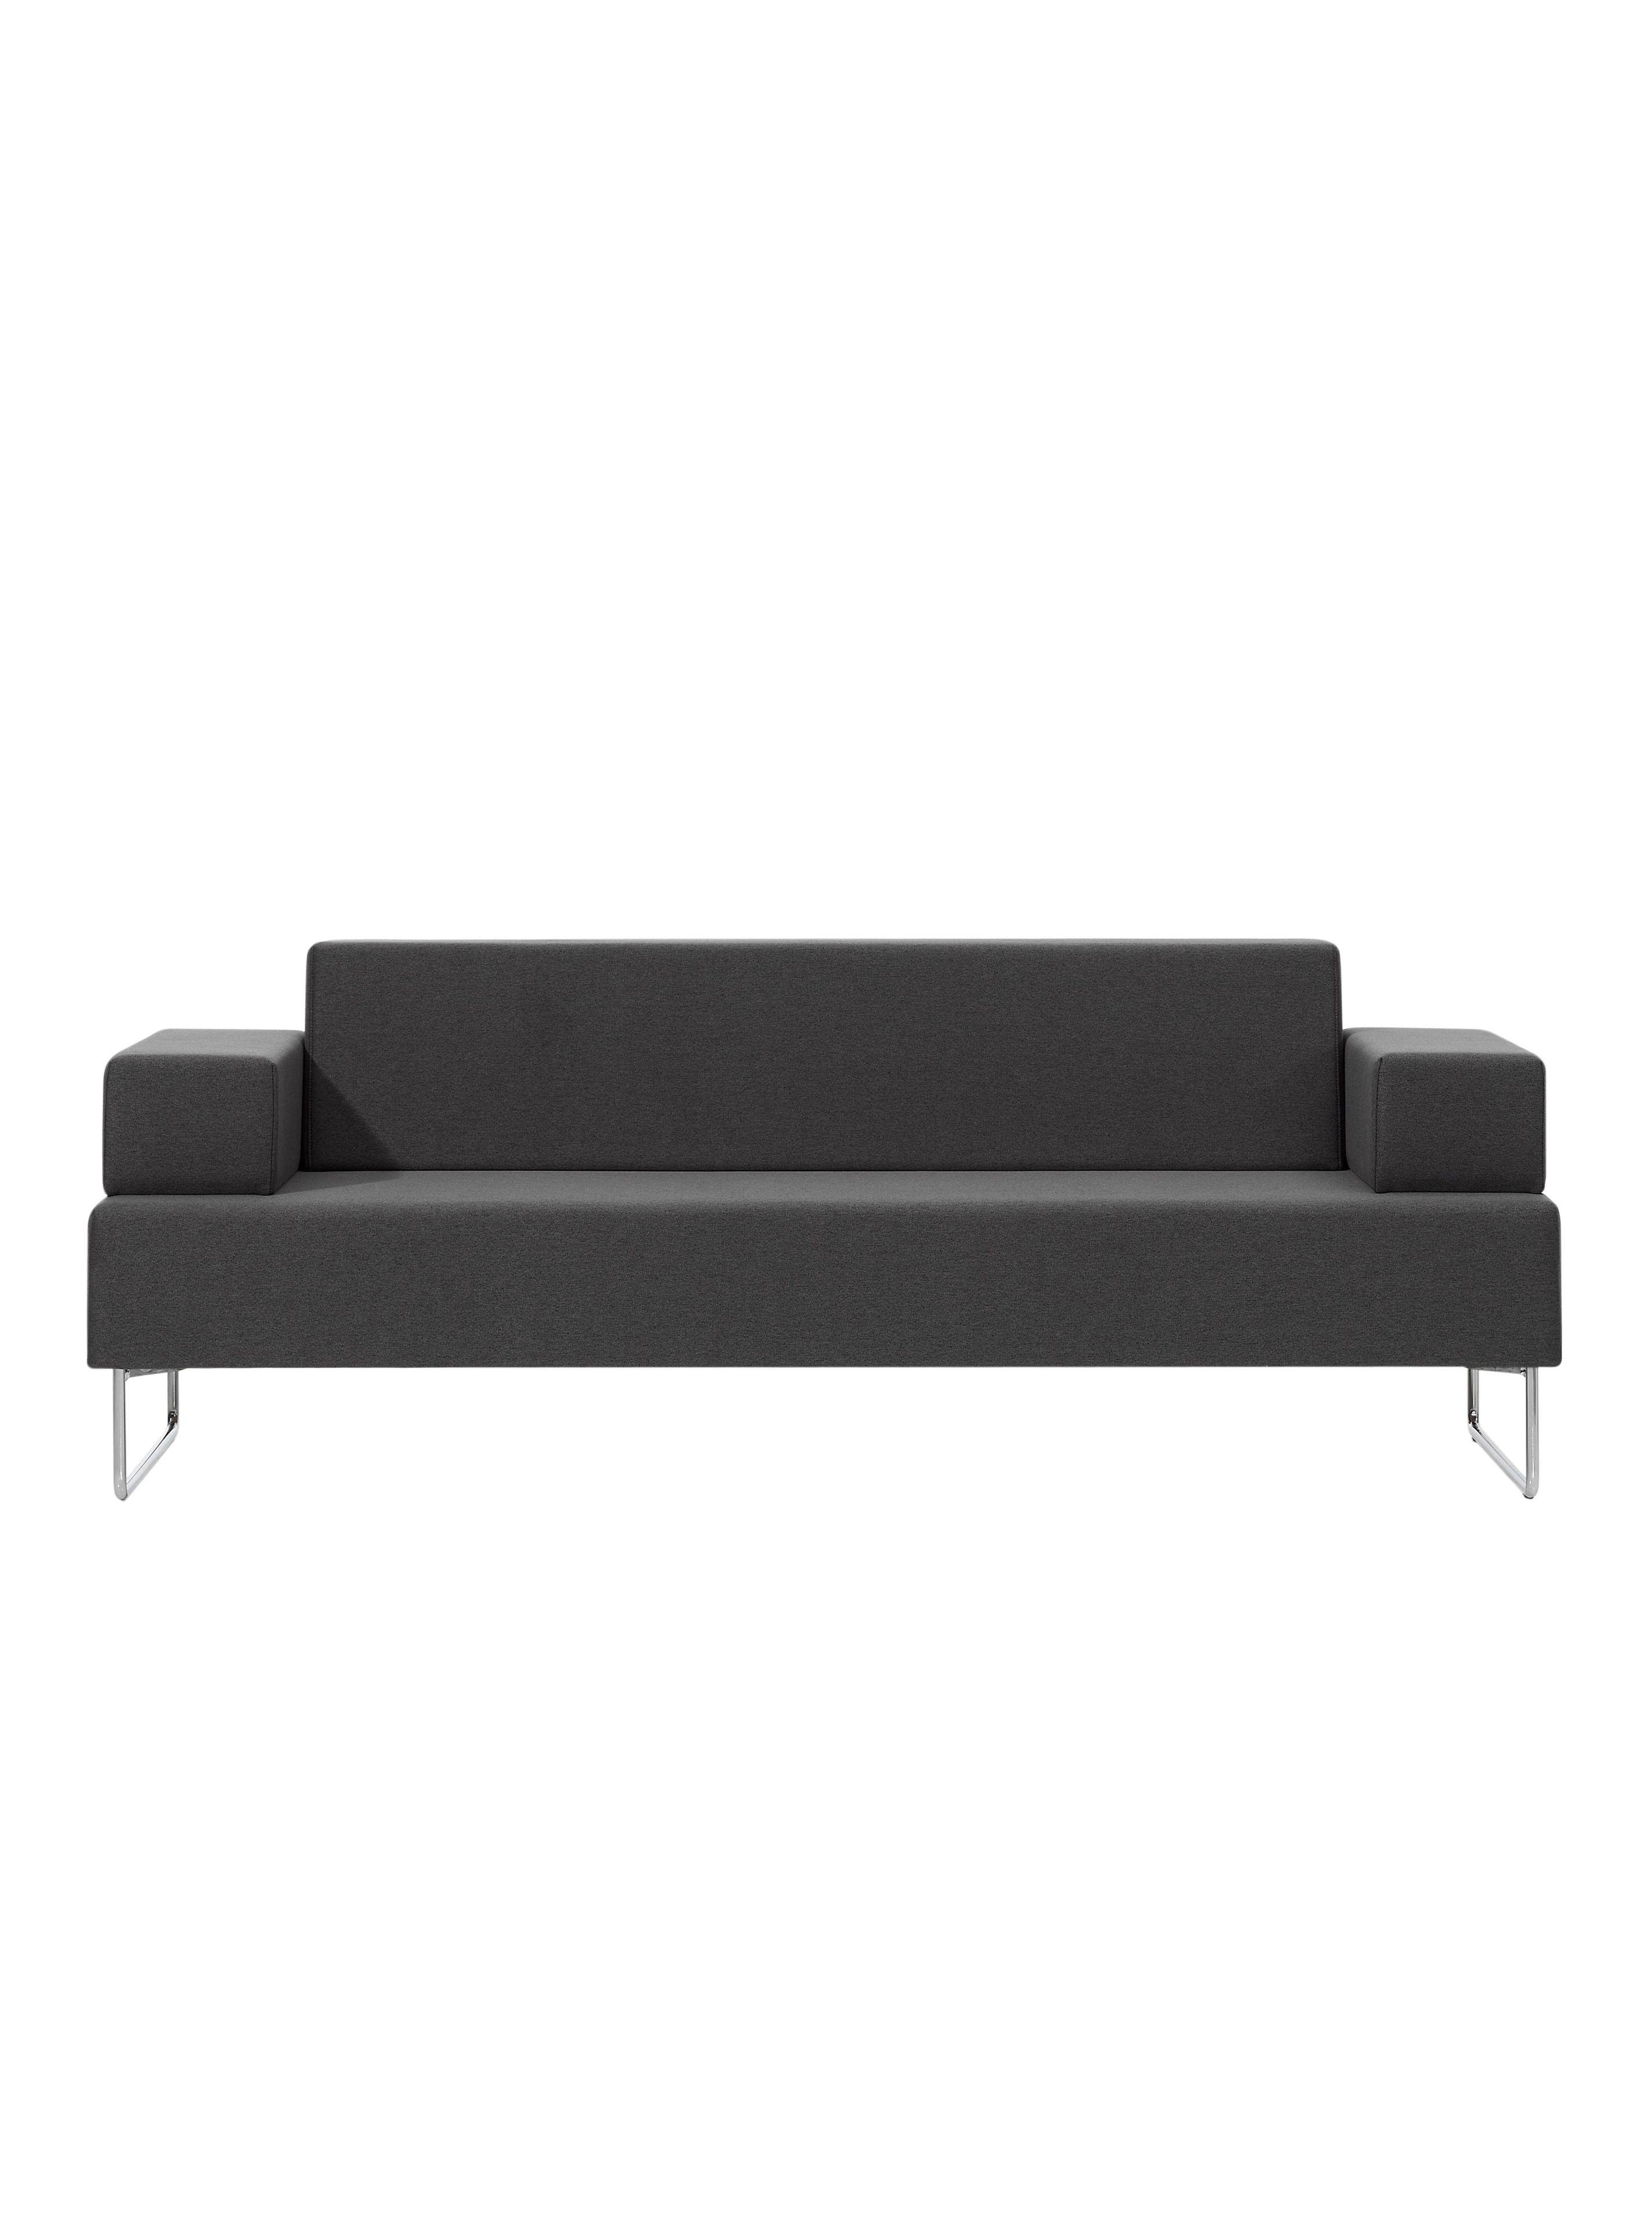 tetris canap composable by inclass mobles. Black Bedroom Furniture Sets. Home Design Ideas